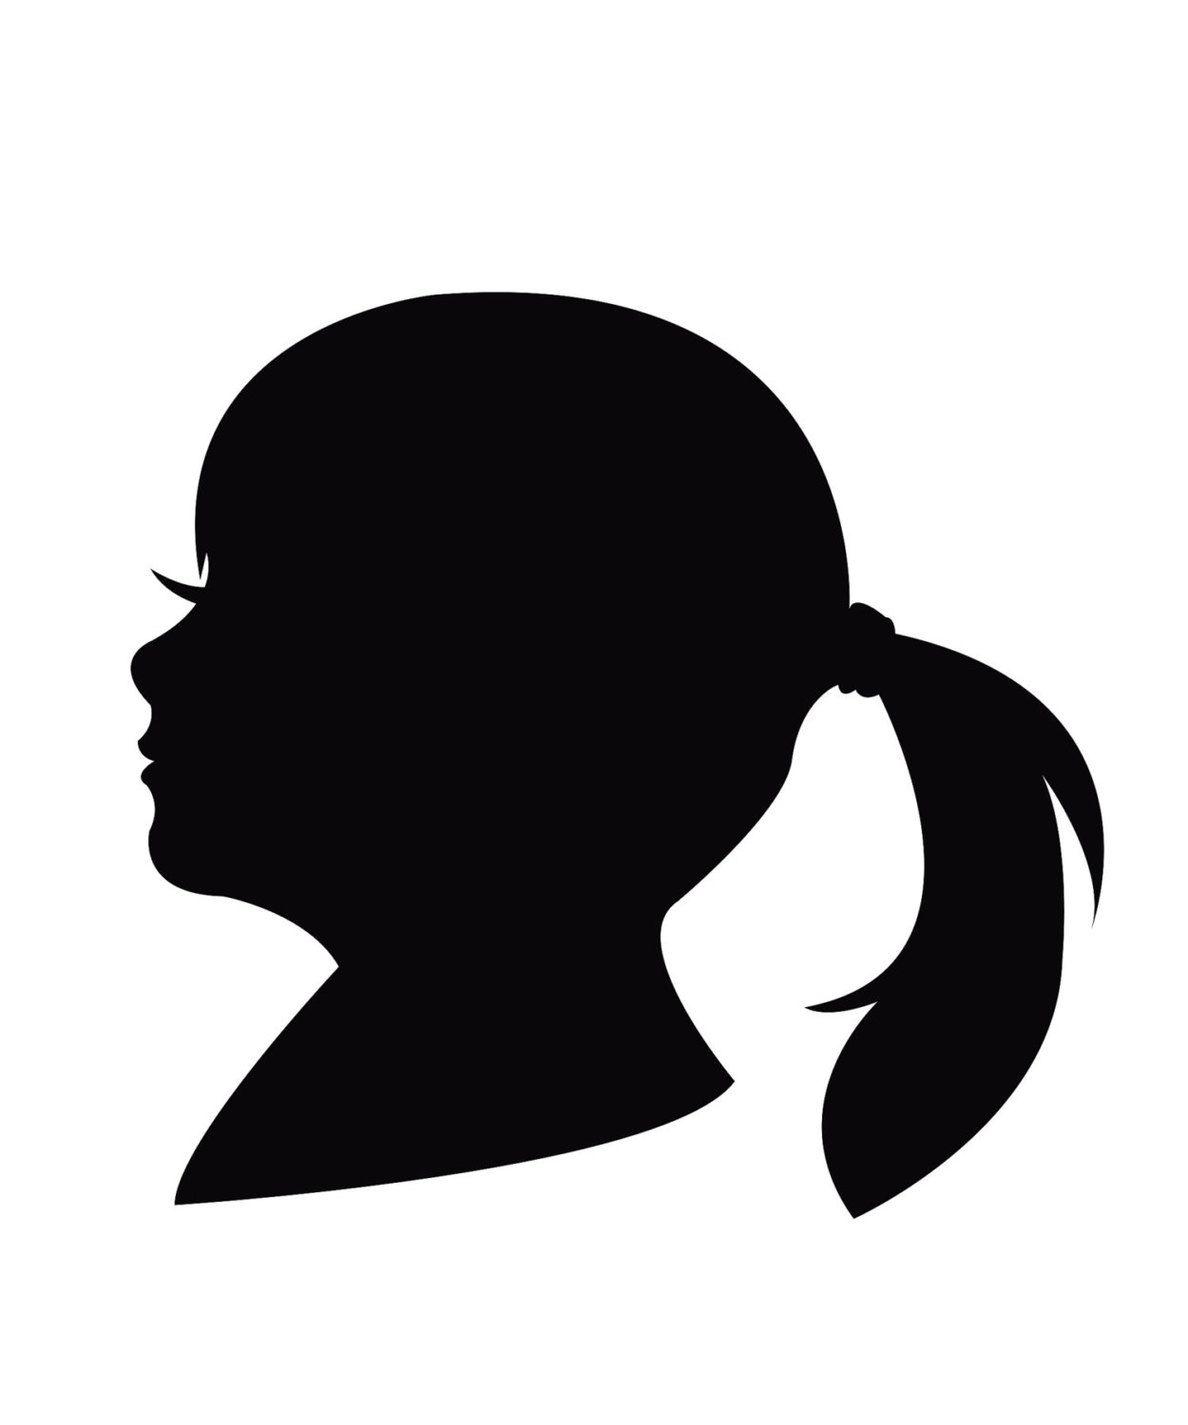 Female Head Silhouette Clip Art.